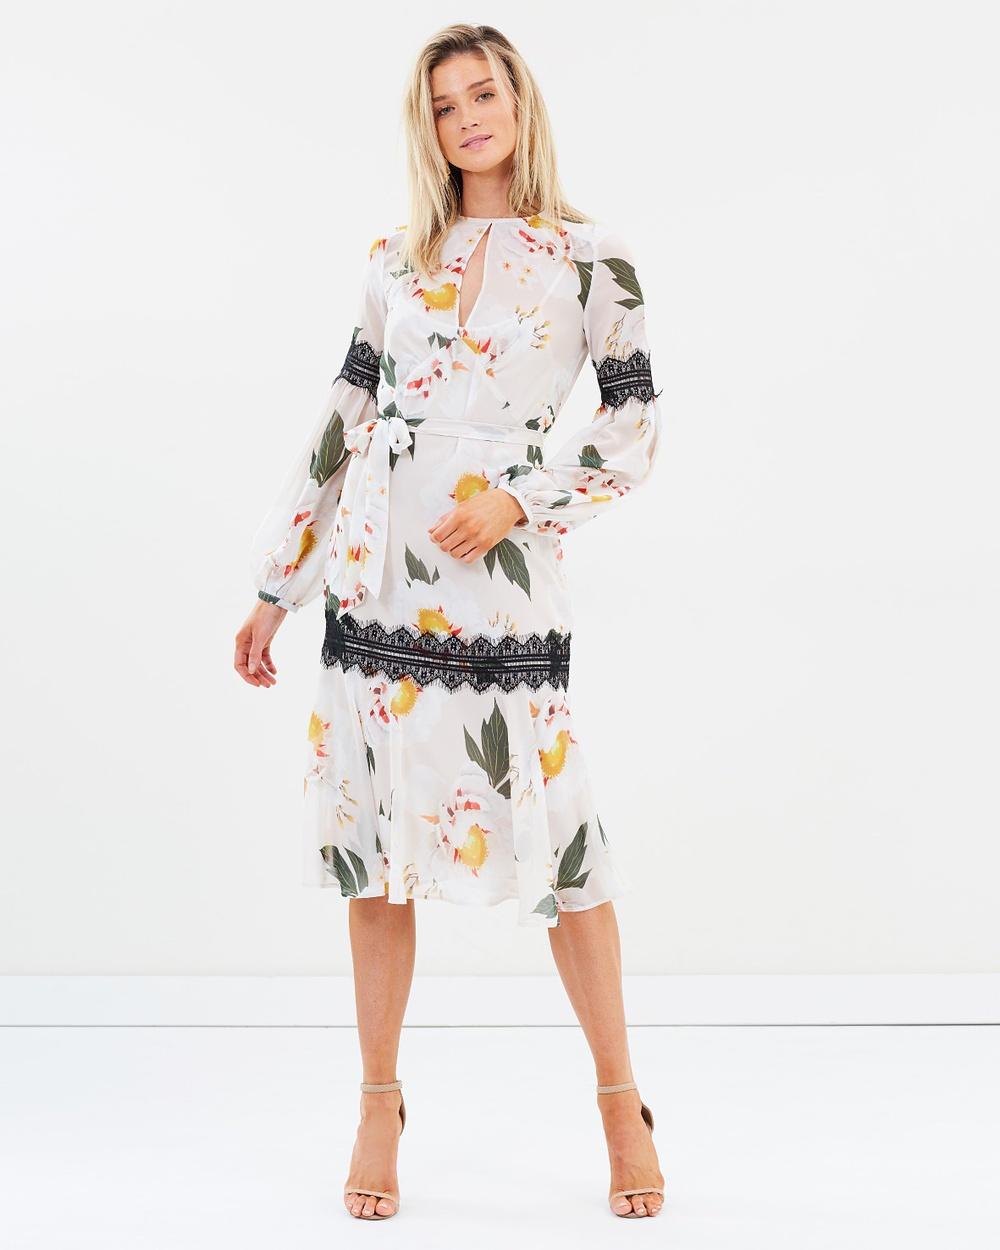 Cooper St Magnolia Long Sleeve Midi Dress Printed Dresses Print Light Magnolia Long Sleeve Midi Dress